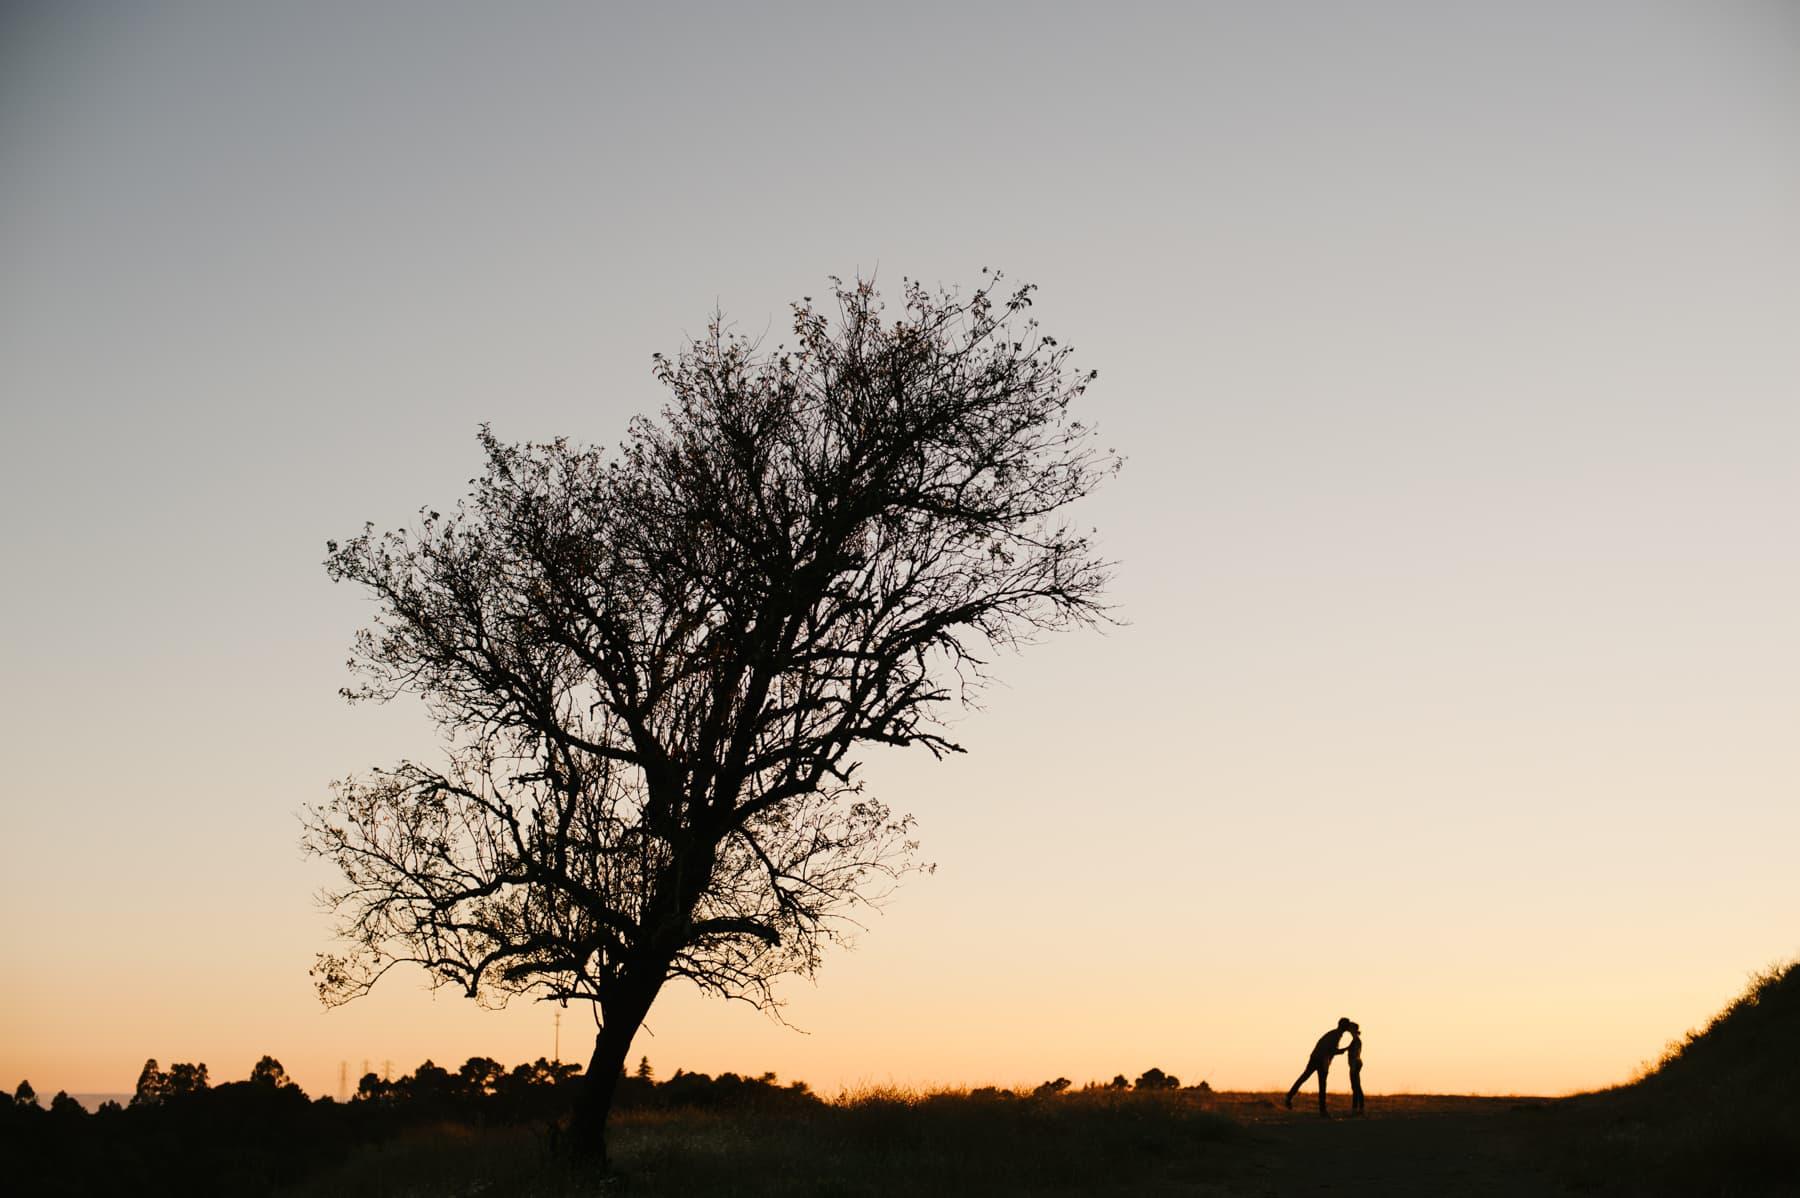 Sunset at Sibley Park Engagement